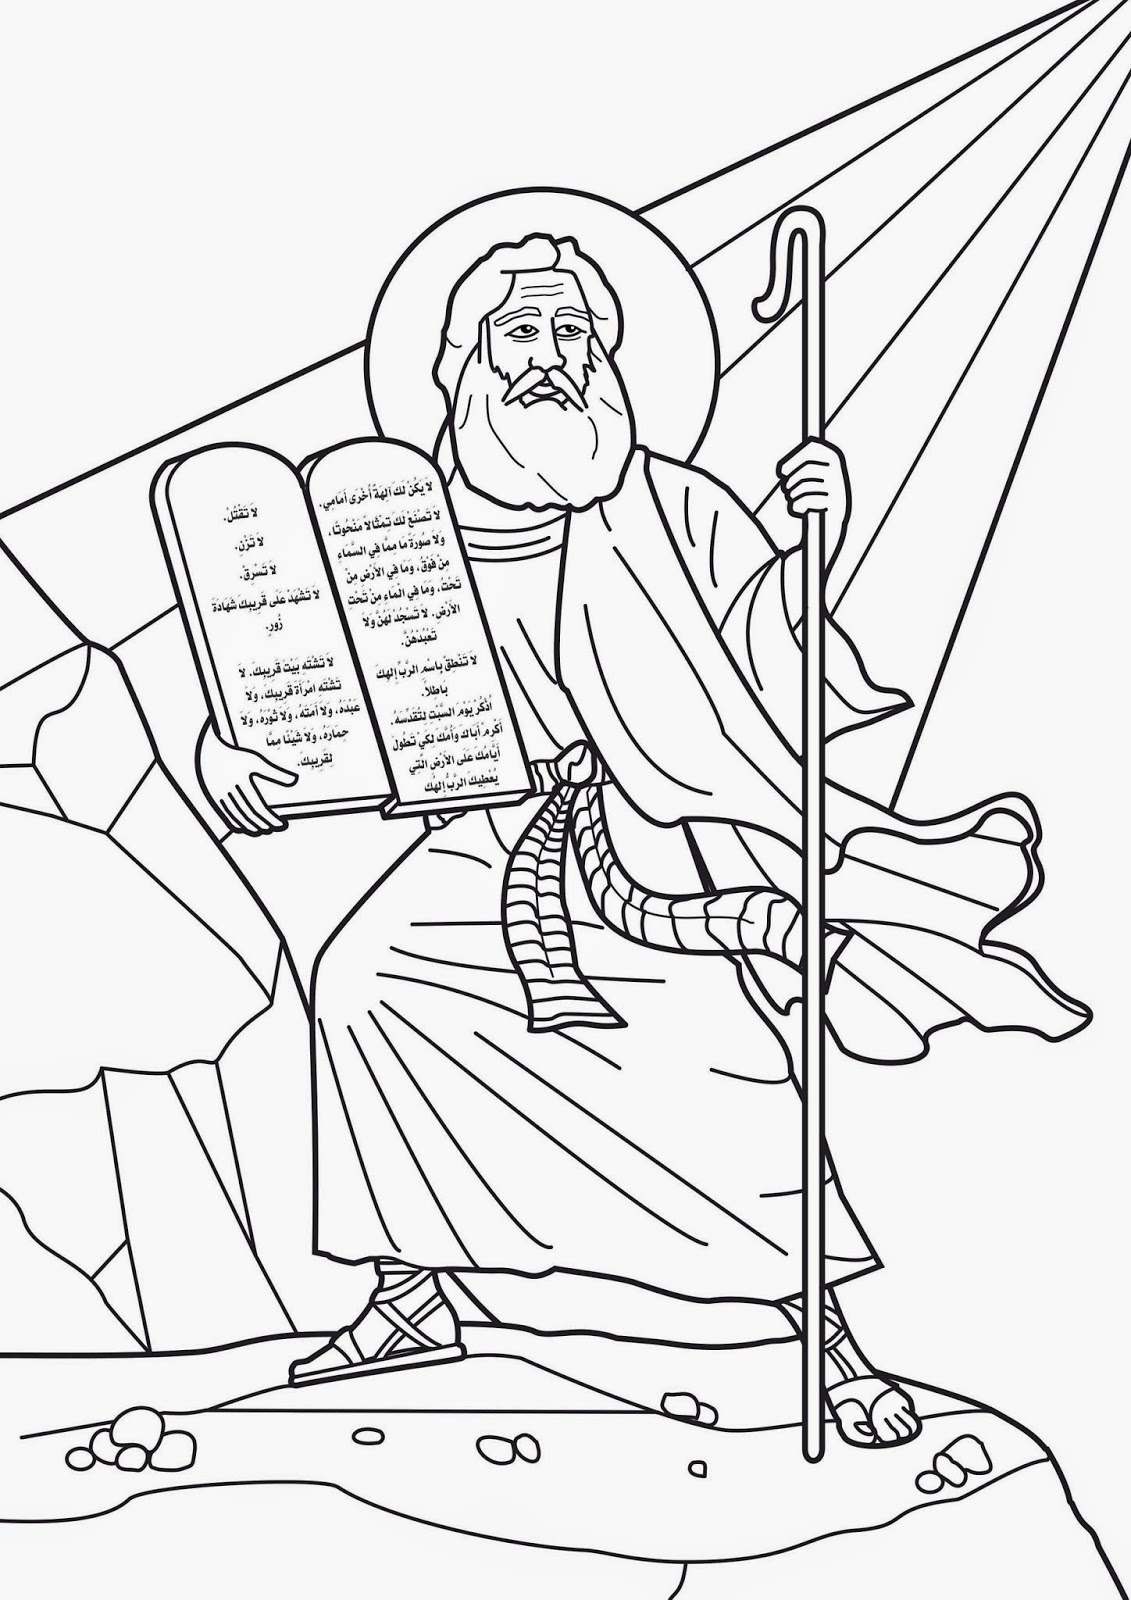 Dibujos de Moisés para colorear ~ Dibujos para Niños